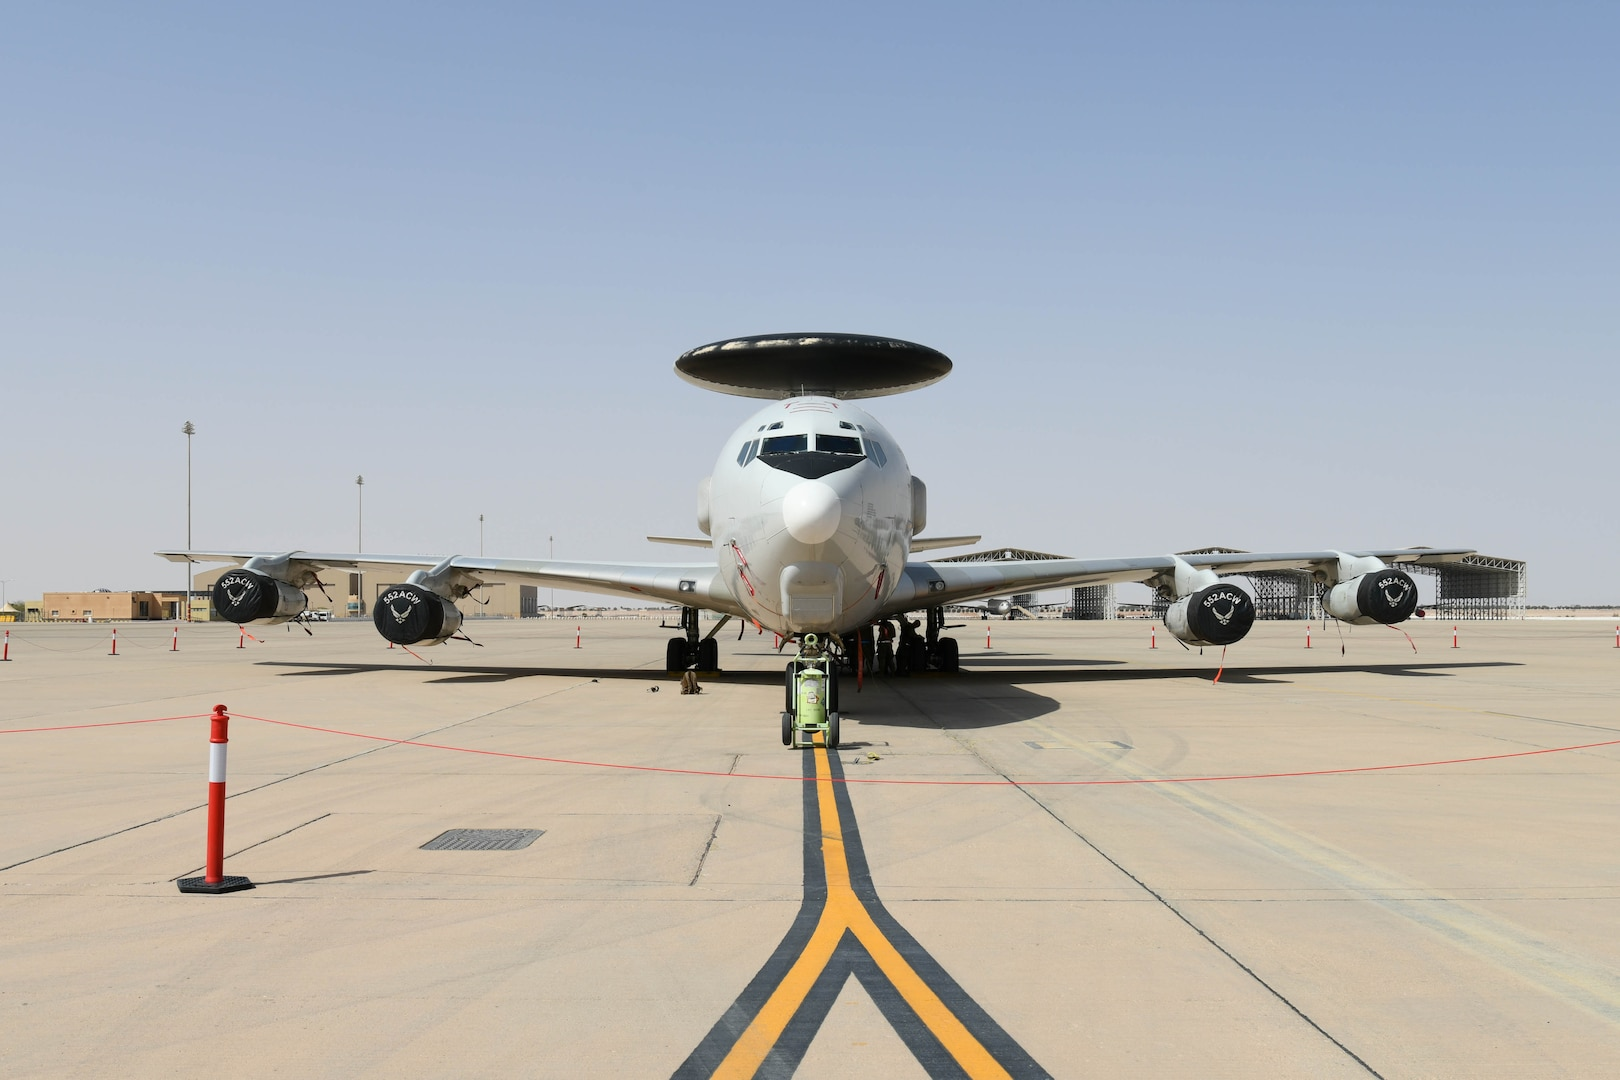 An E-3 Sentry (AWACS) sits on the flightline at Prince Sultan Air Base, Kingdom of Saudi Arabia, March 1, 2021.